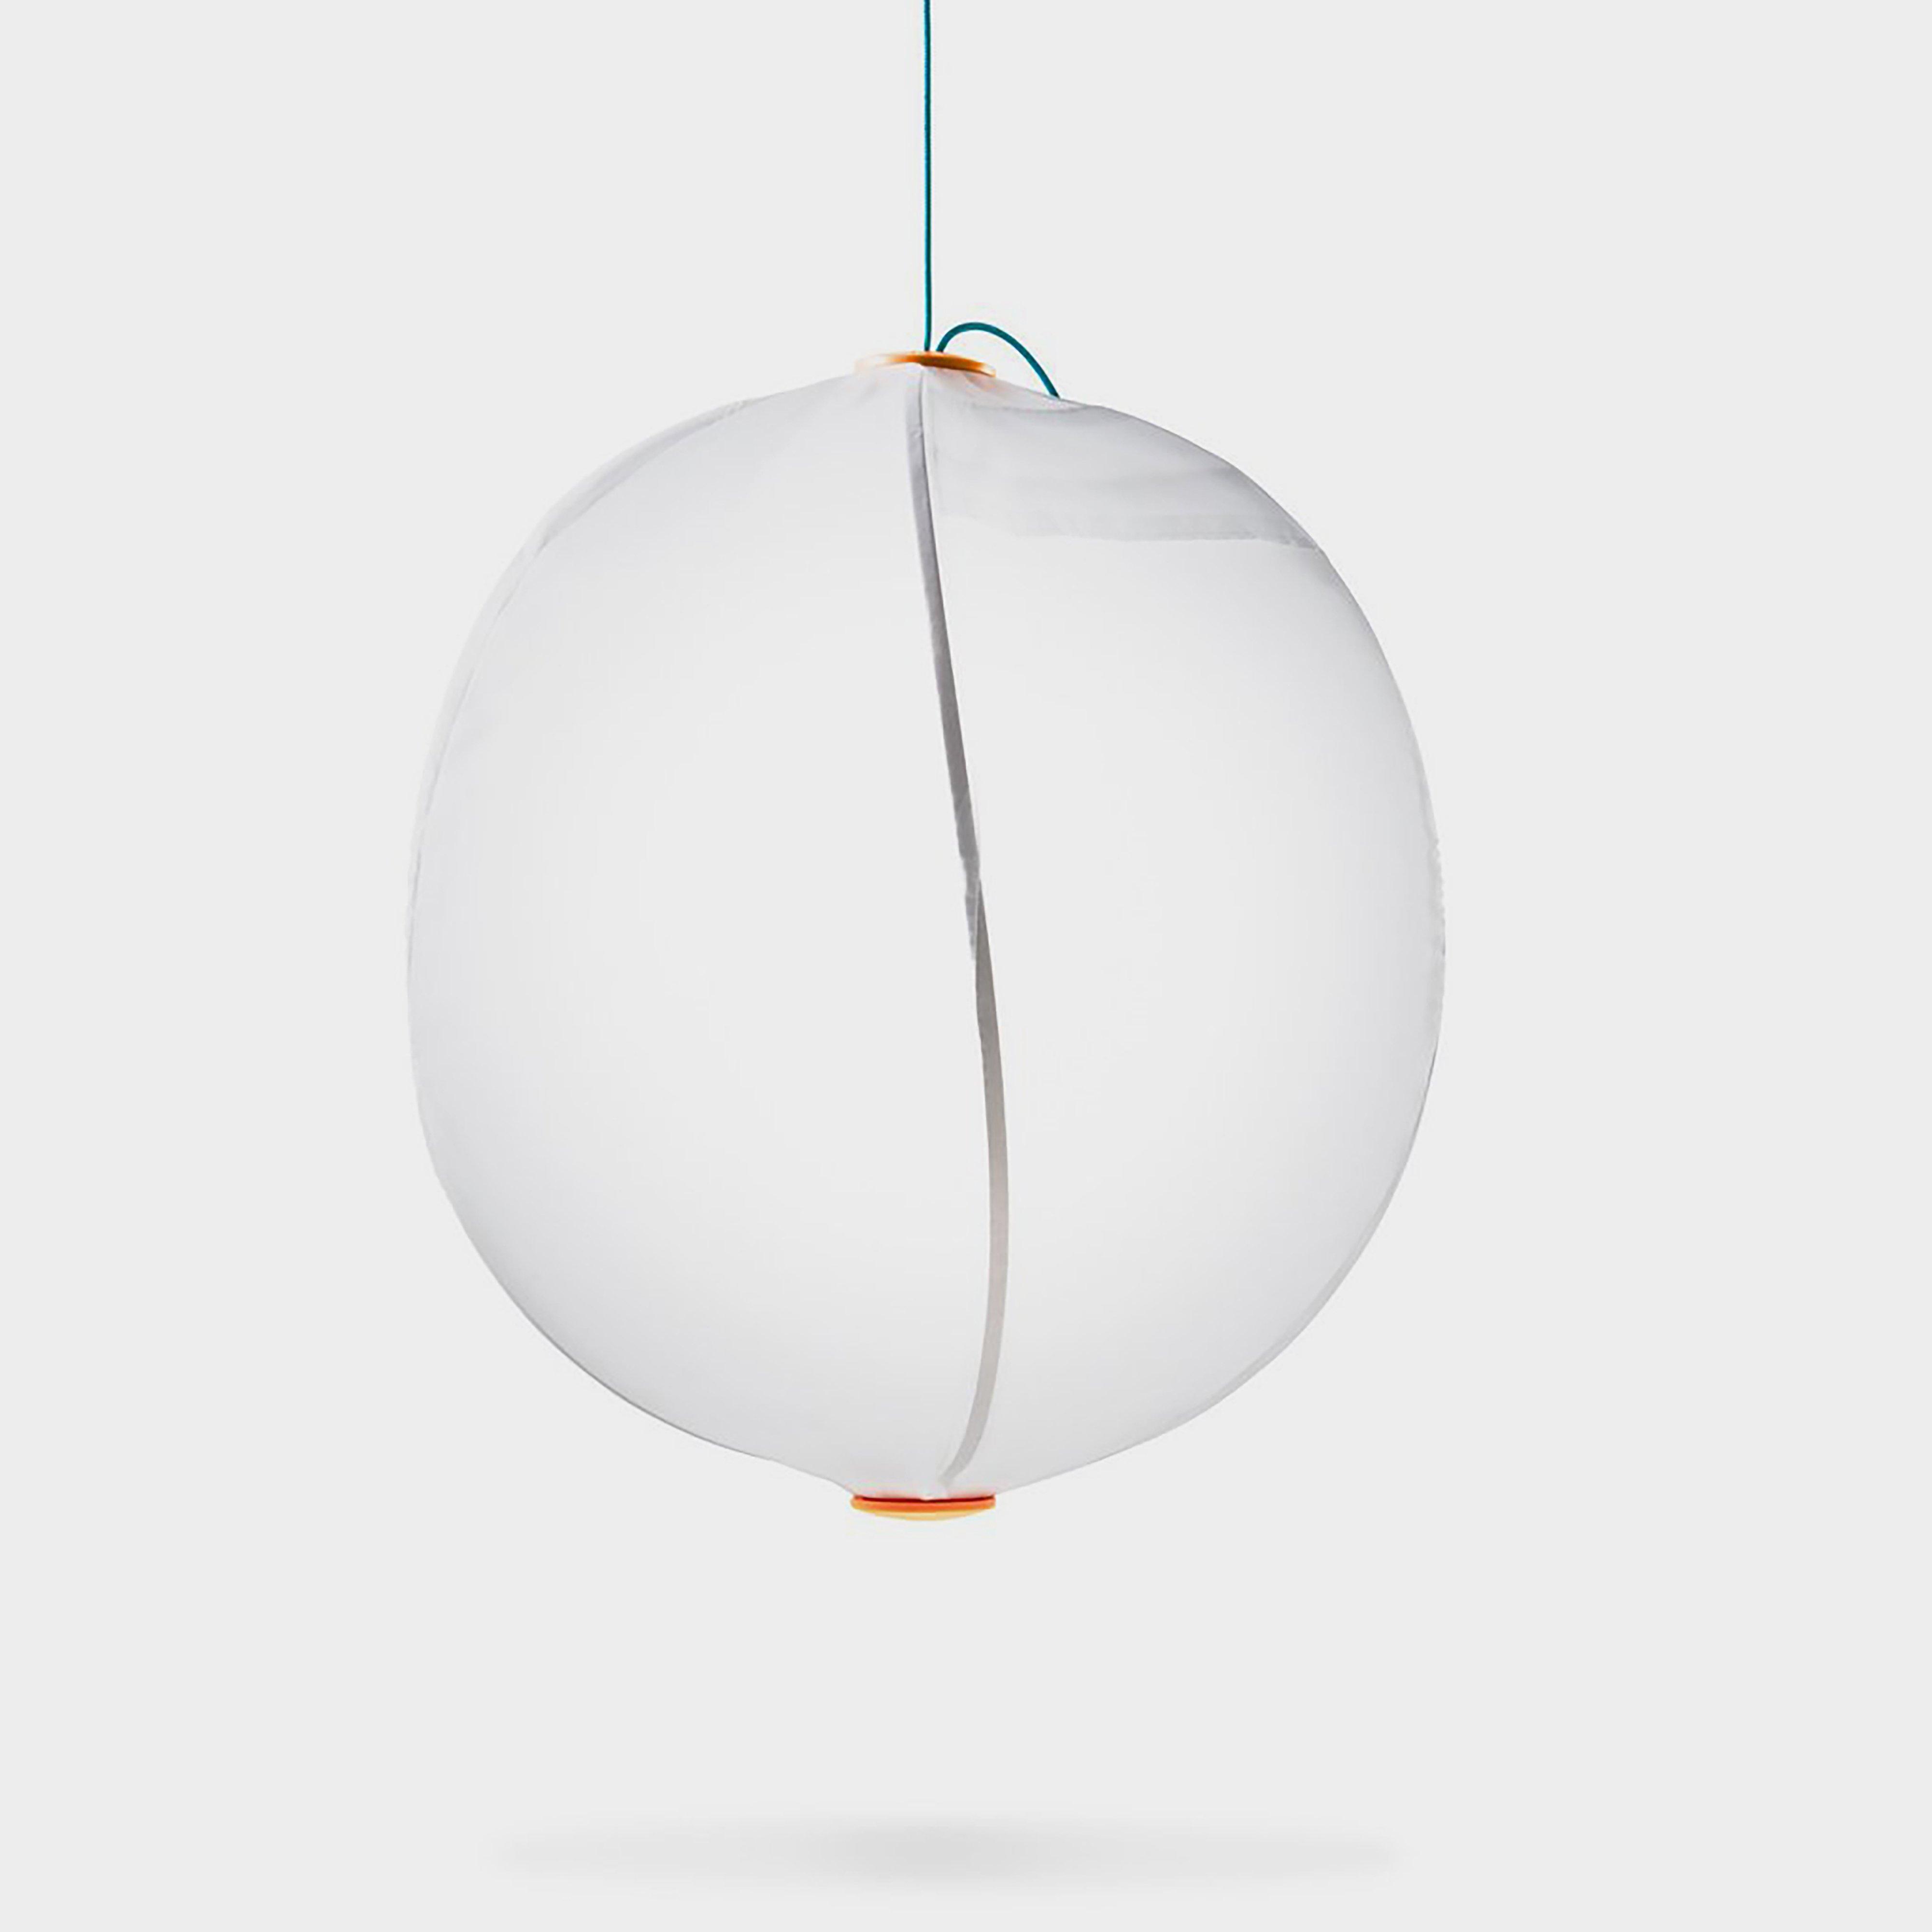 Biolite Sitelight Lantern - White/White, White